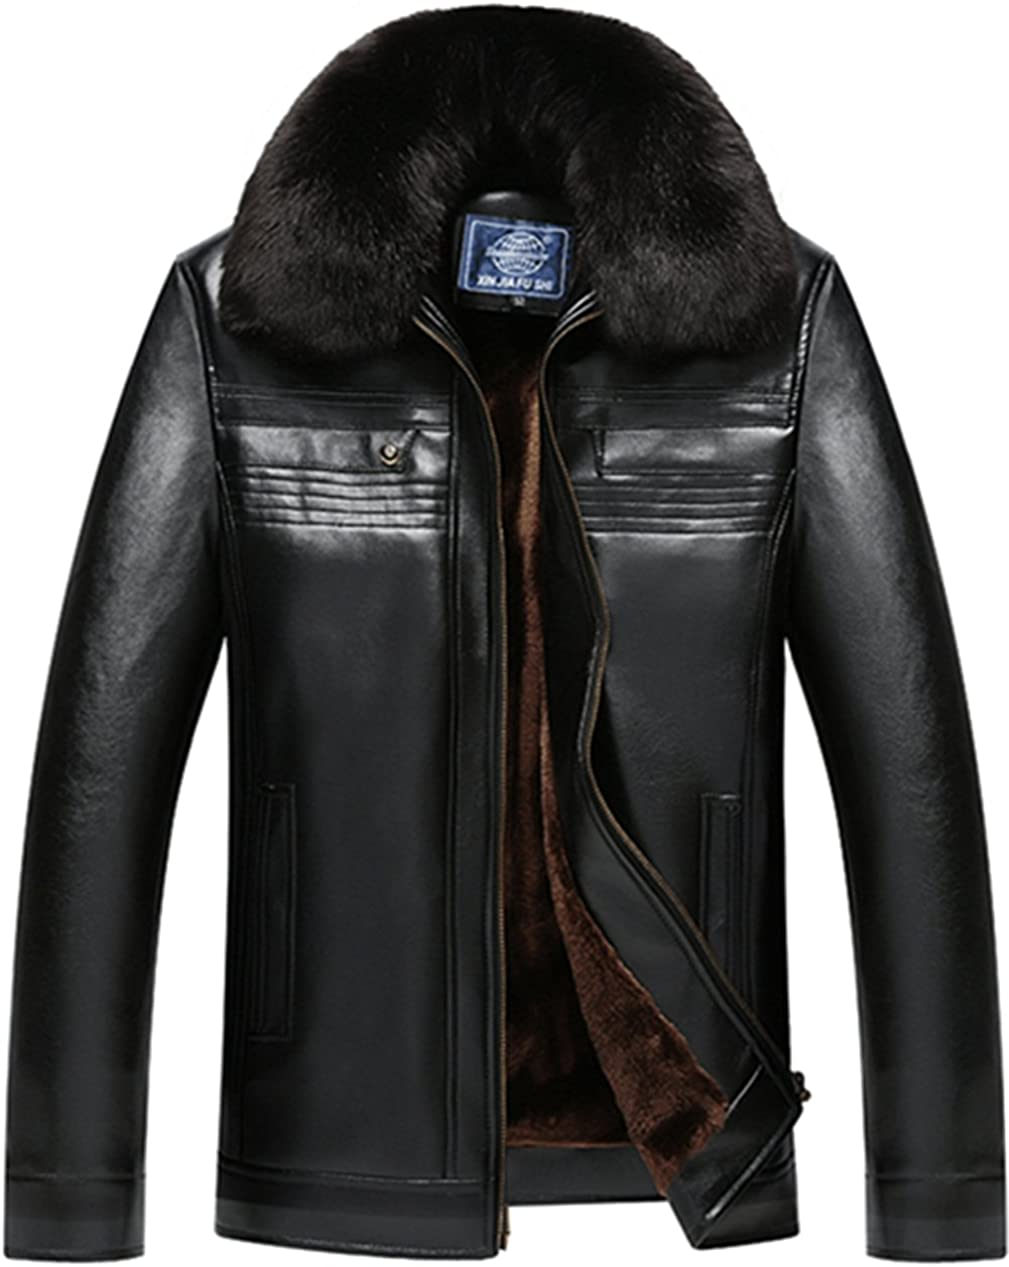 K3K New Winter Mens PU Leather Warm Coat Faux Fur Lined Leather Long Jacket